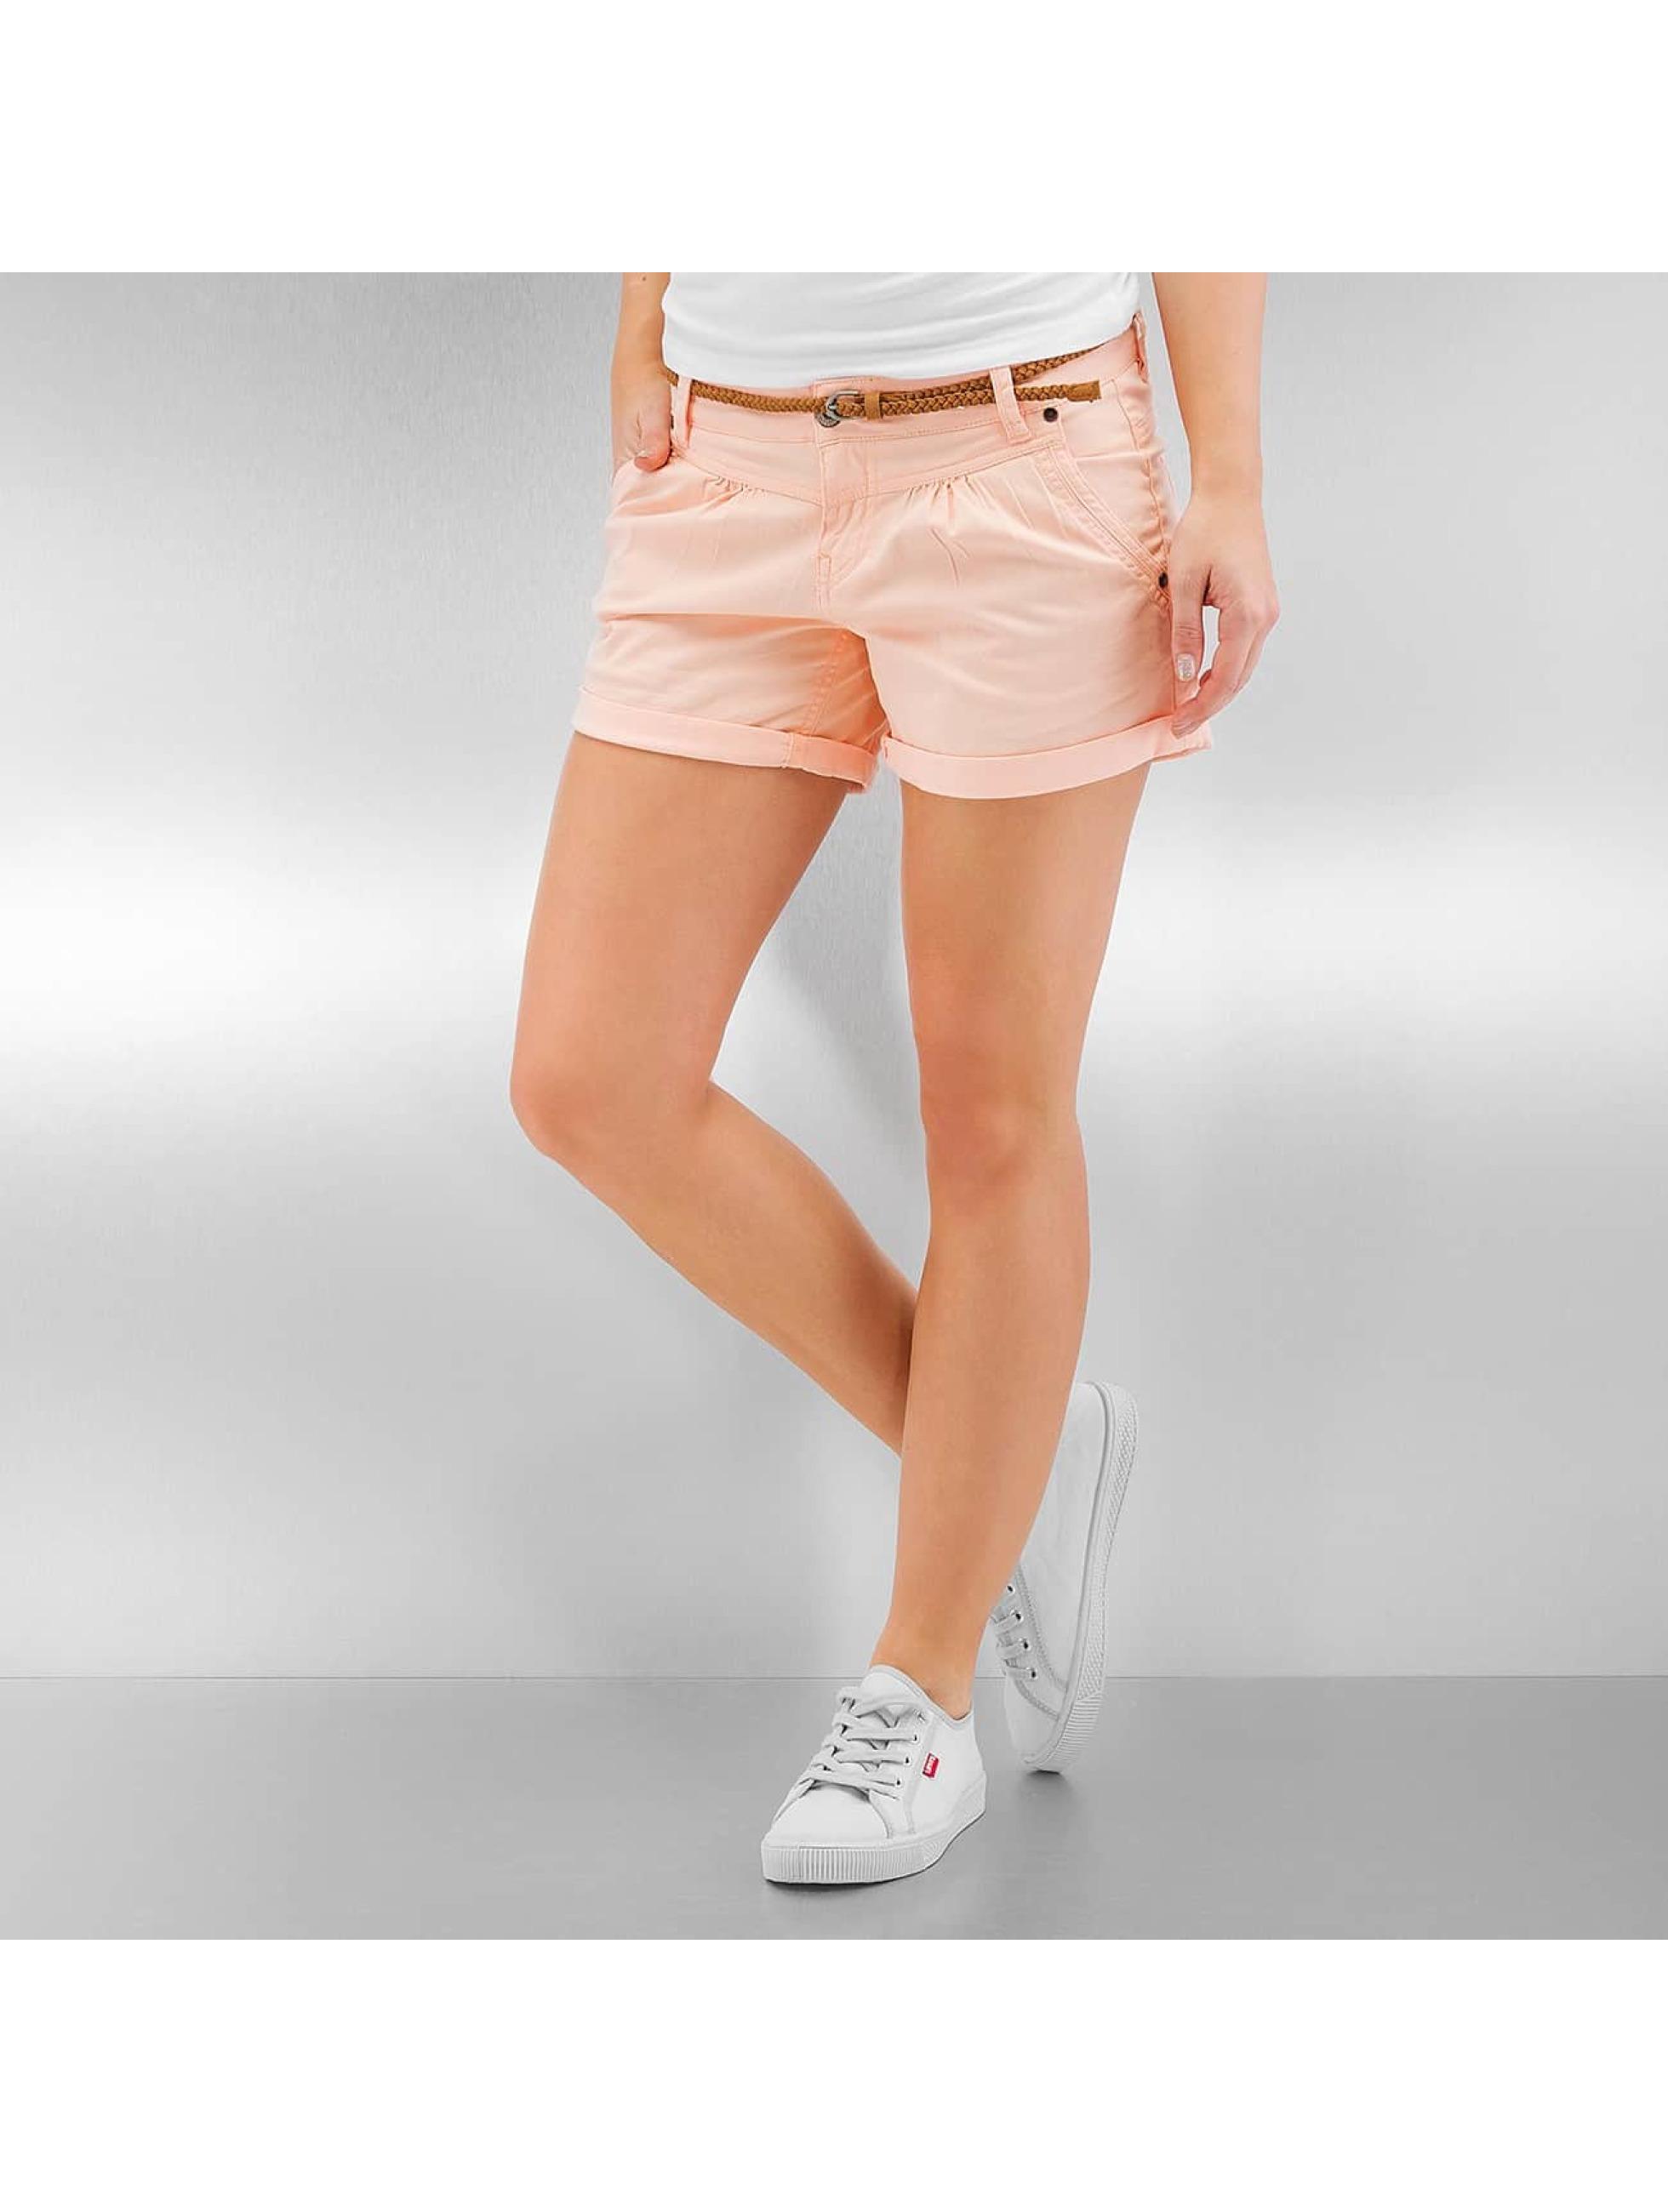 Authentic Style Frauen Shorts Luana in orange